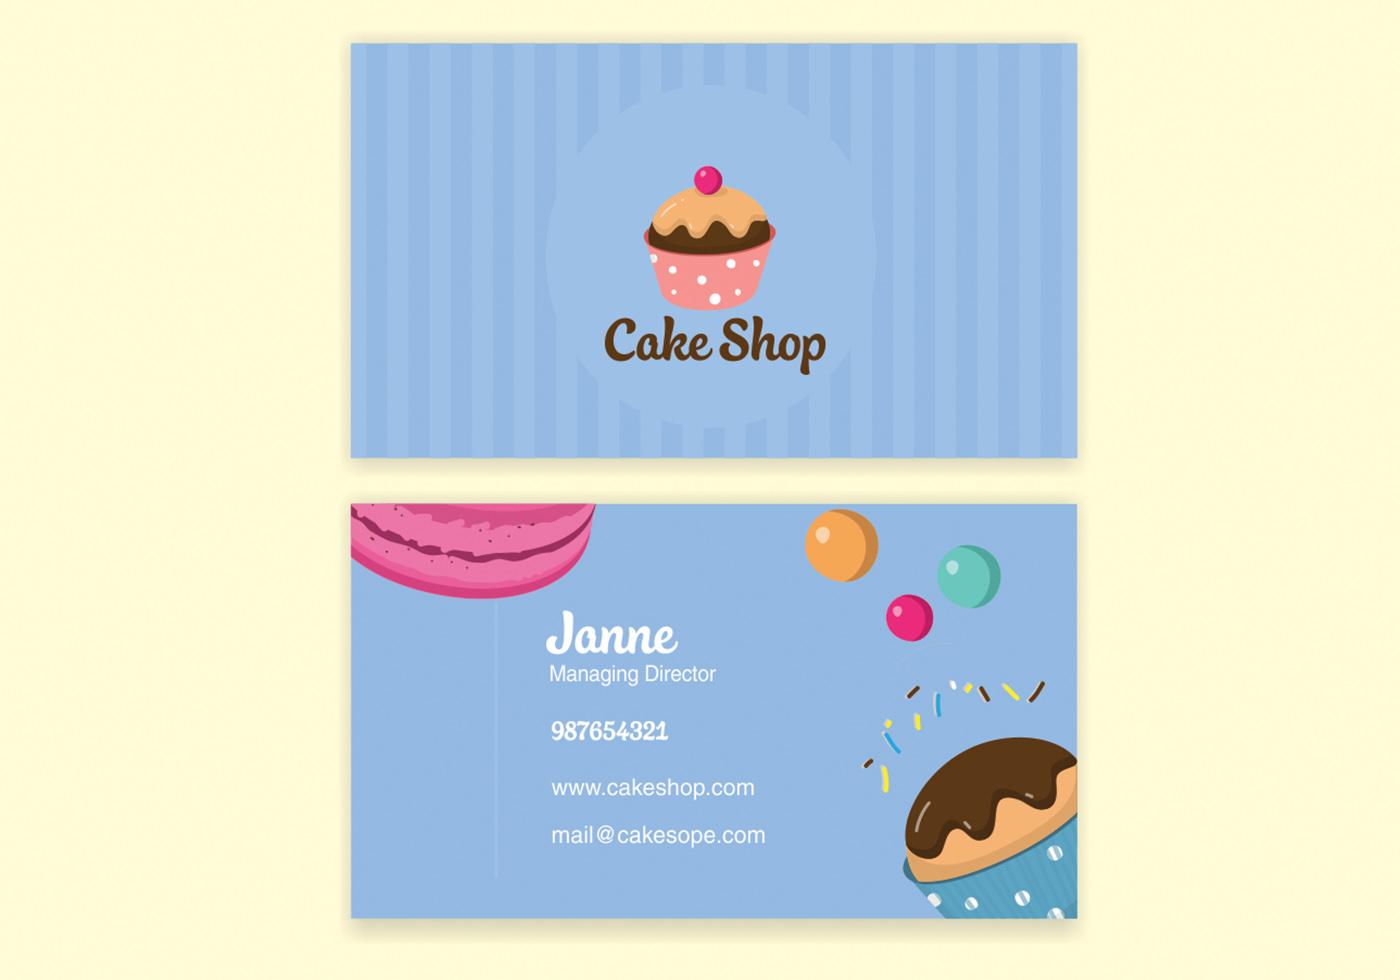 Barber Shop Business Card Free Vector Art - (26196 Free Downloads)